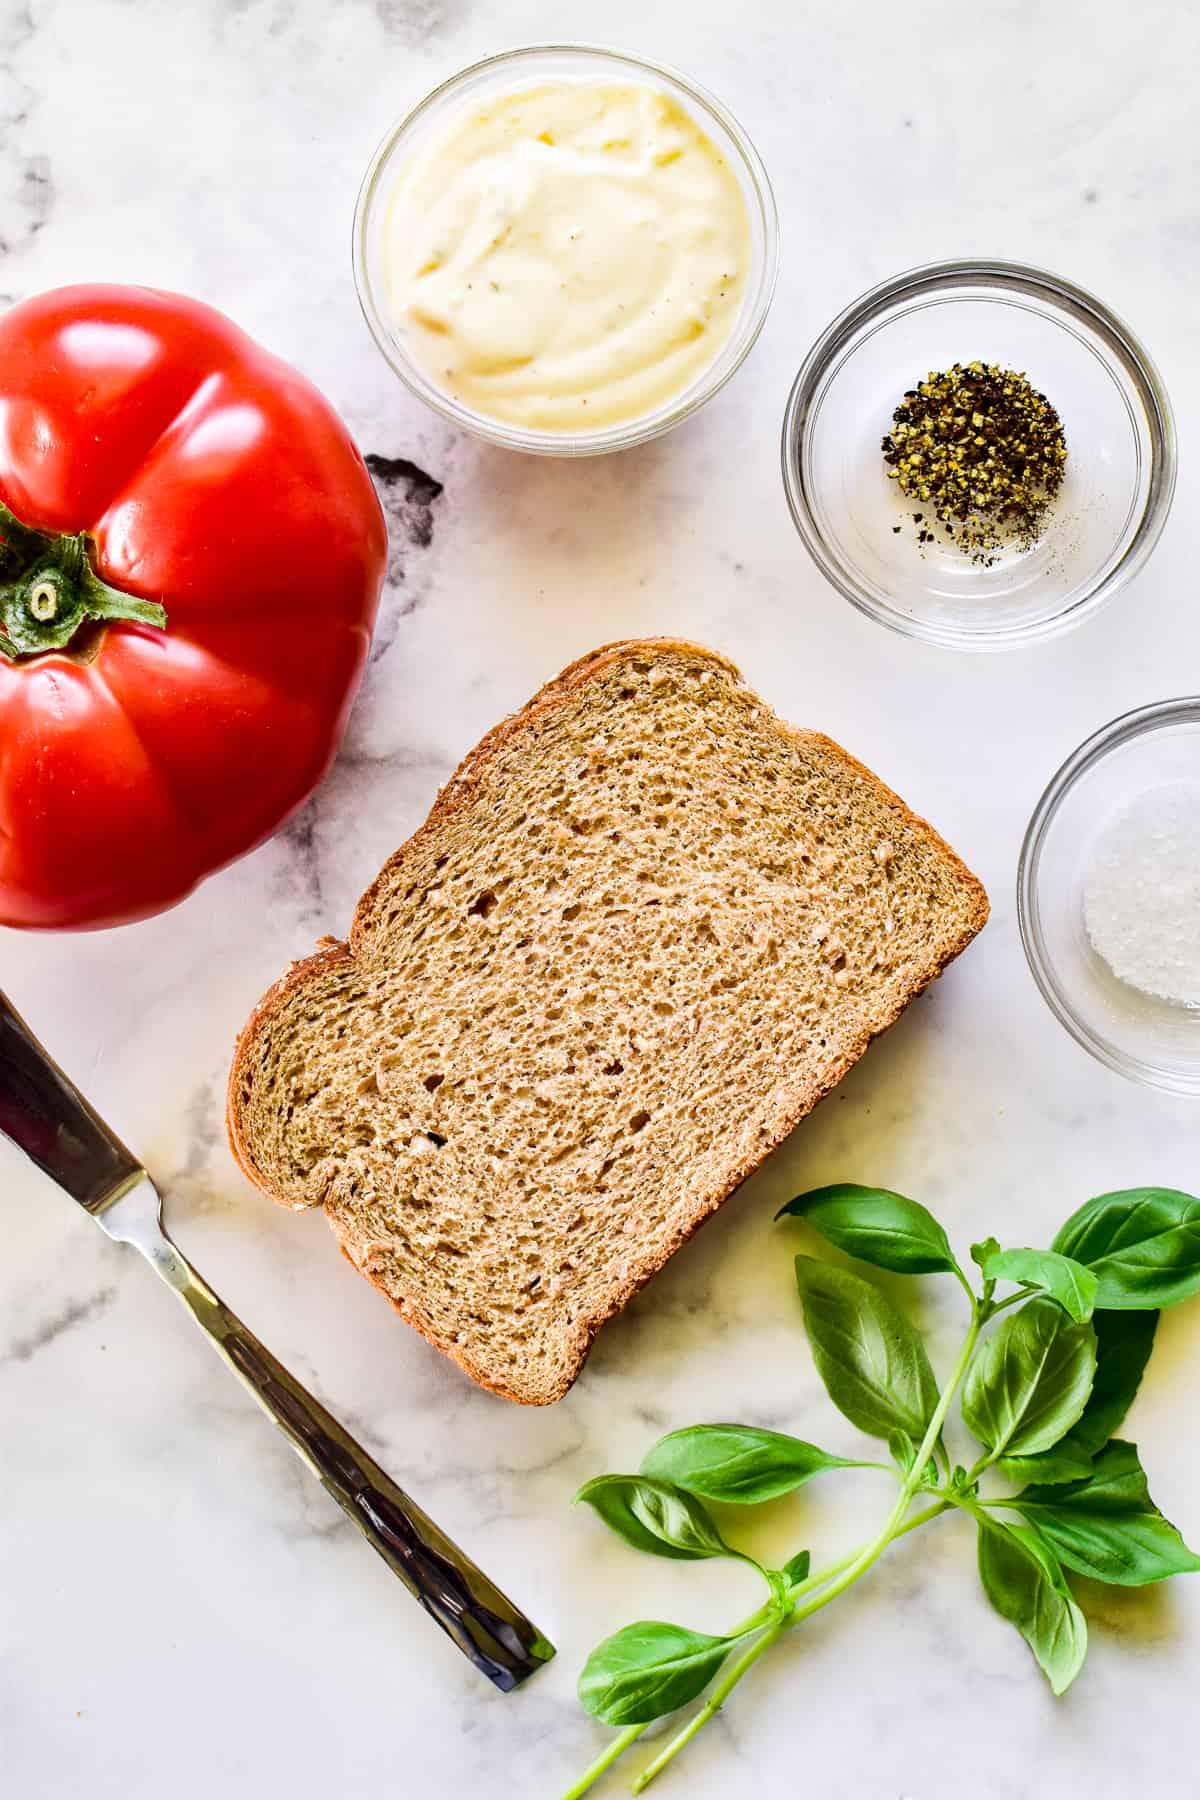 Tomato Sandwich ingredients